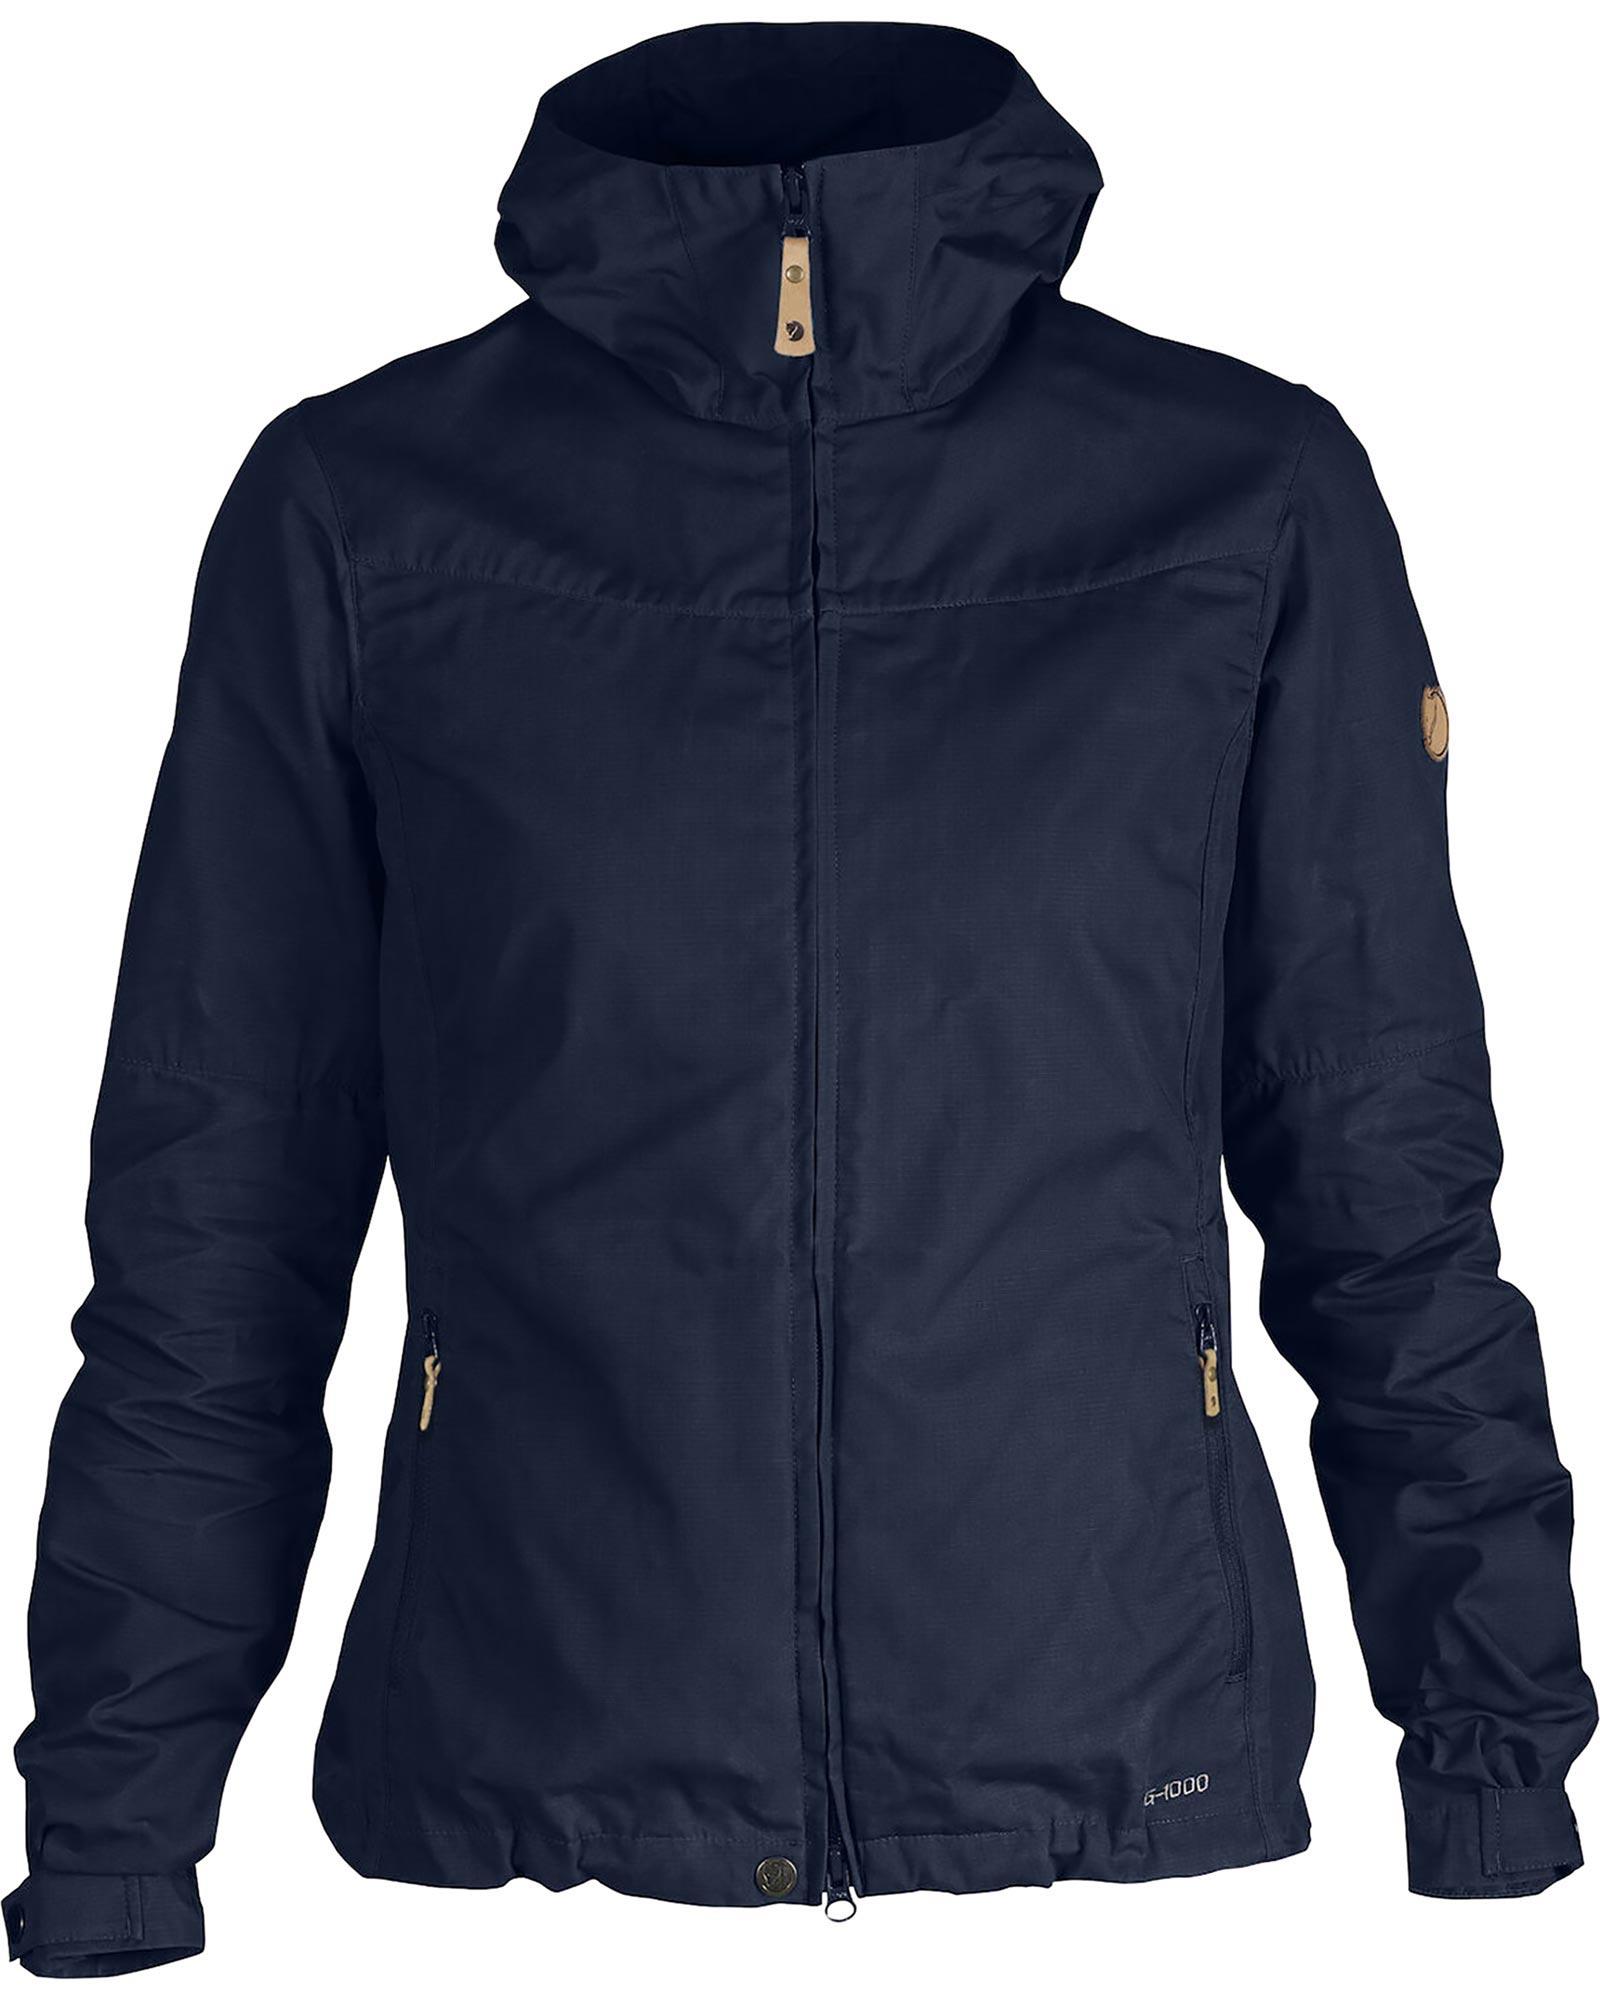 Fjallraven Stina Women's Jacket 0